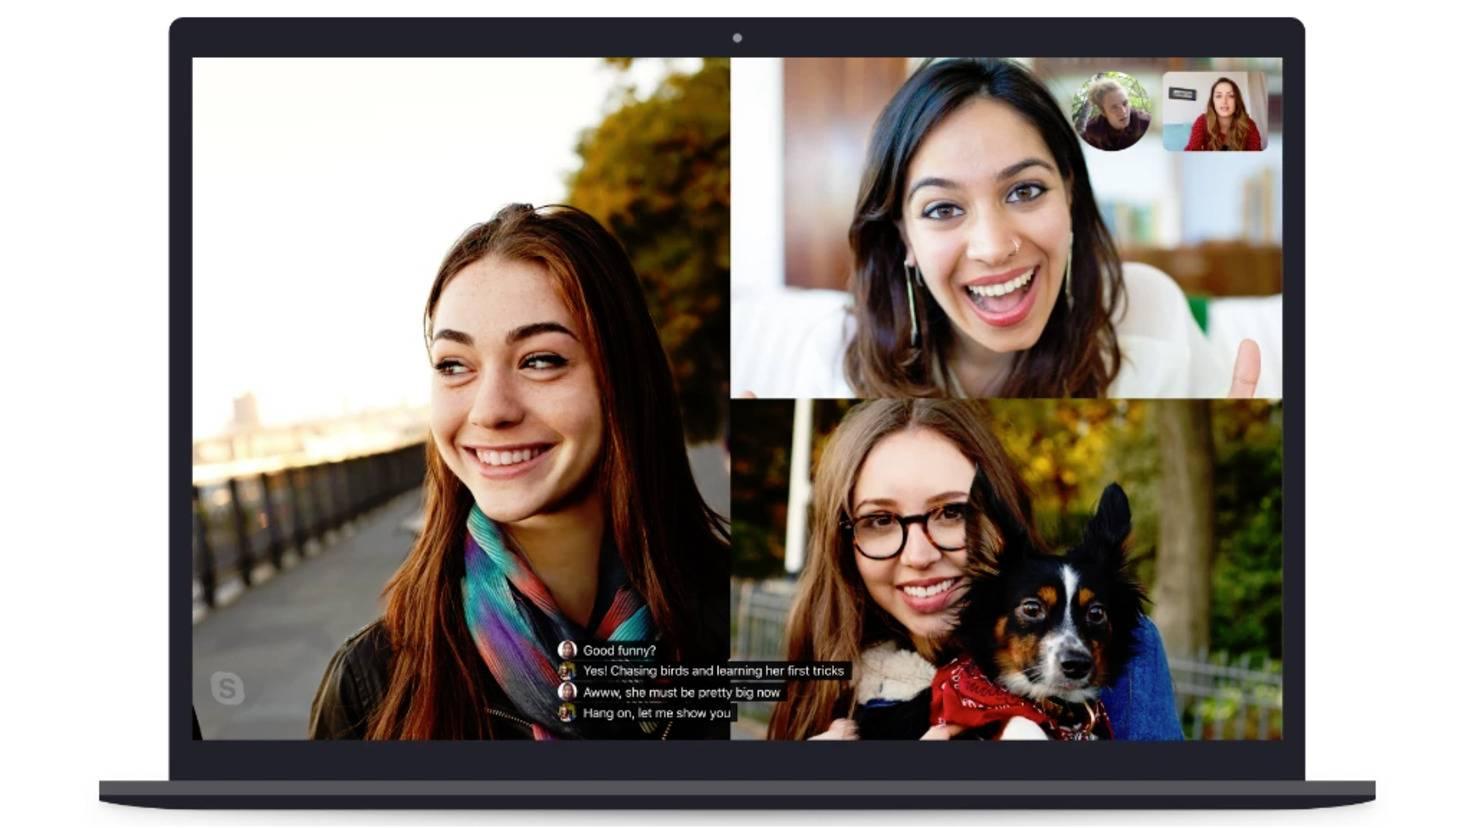 Skype-Untertitel